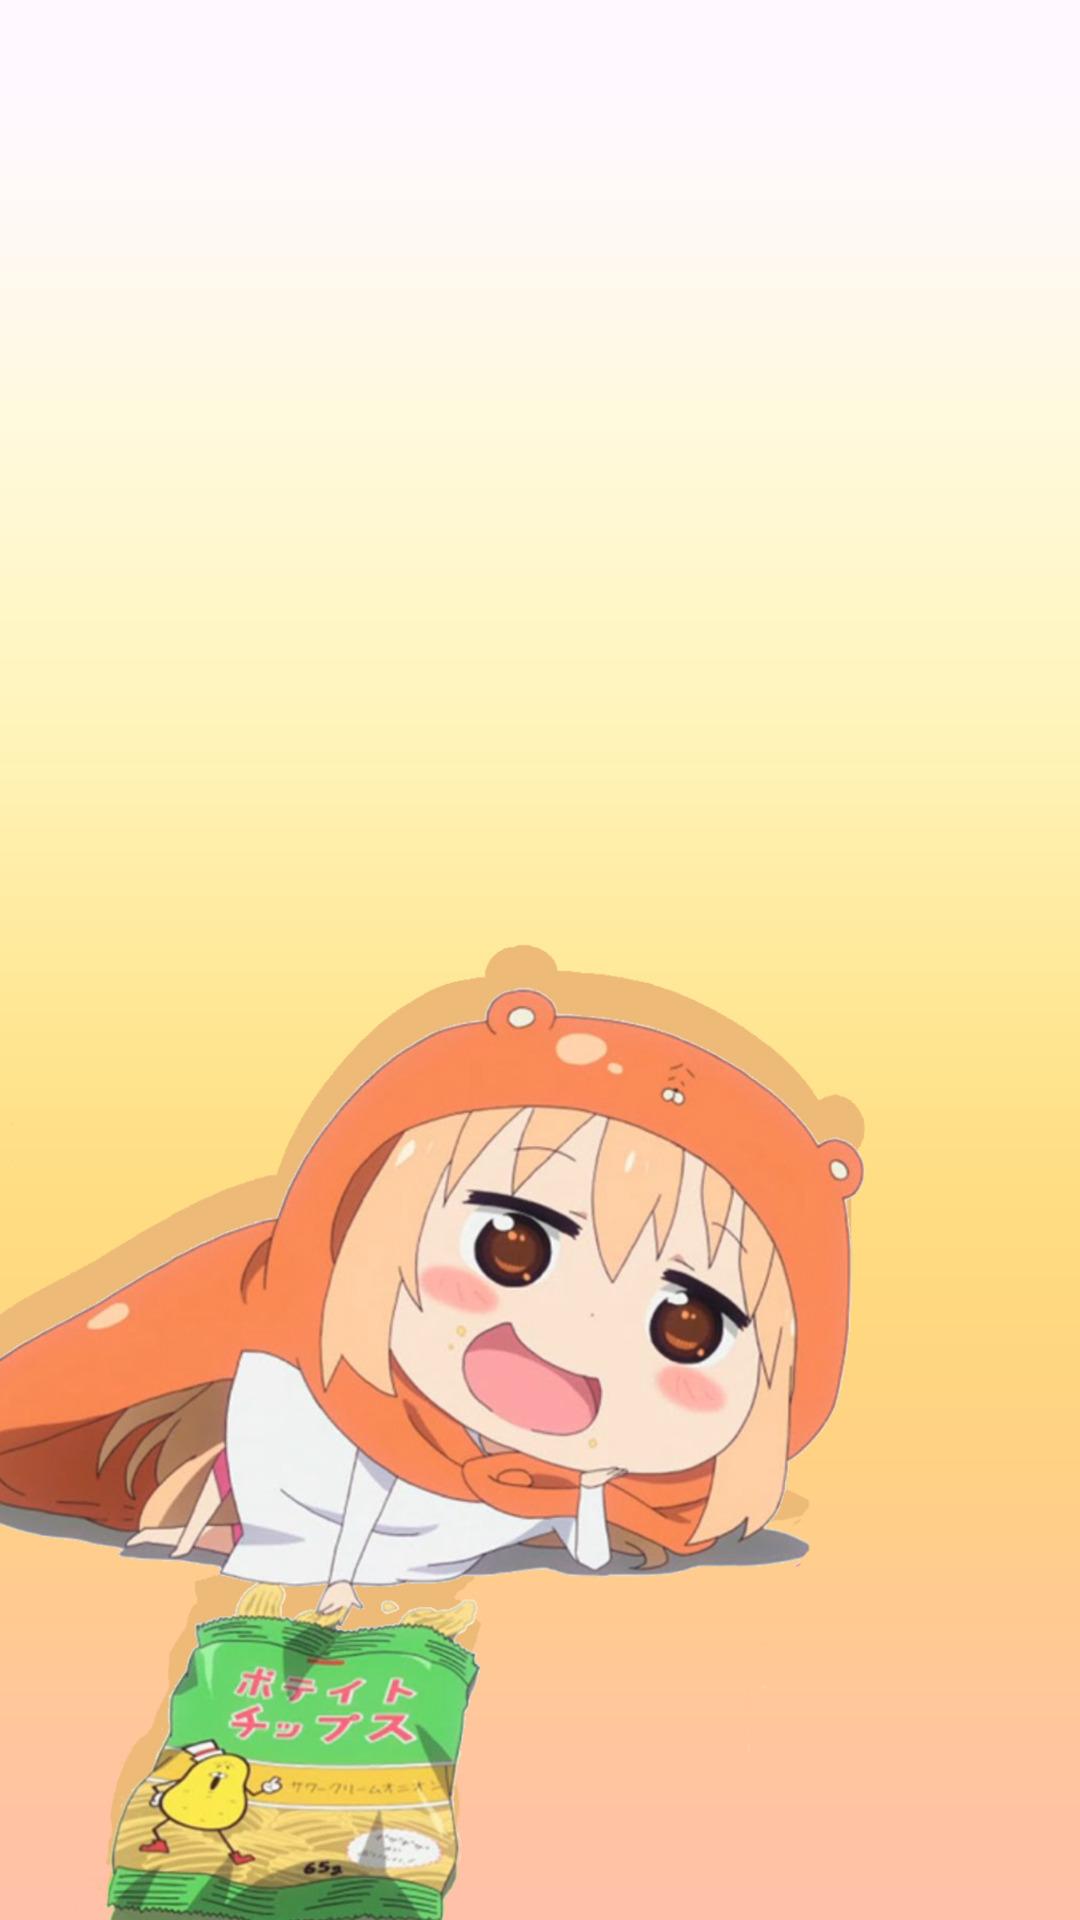 Himouto Umaru Chan Wallpaper Iphone 3159218 Hd Wallpaper Backgrounds Download